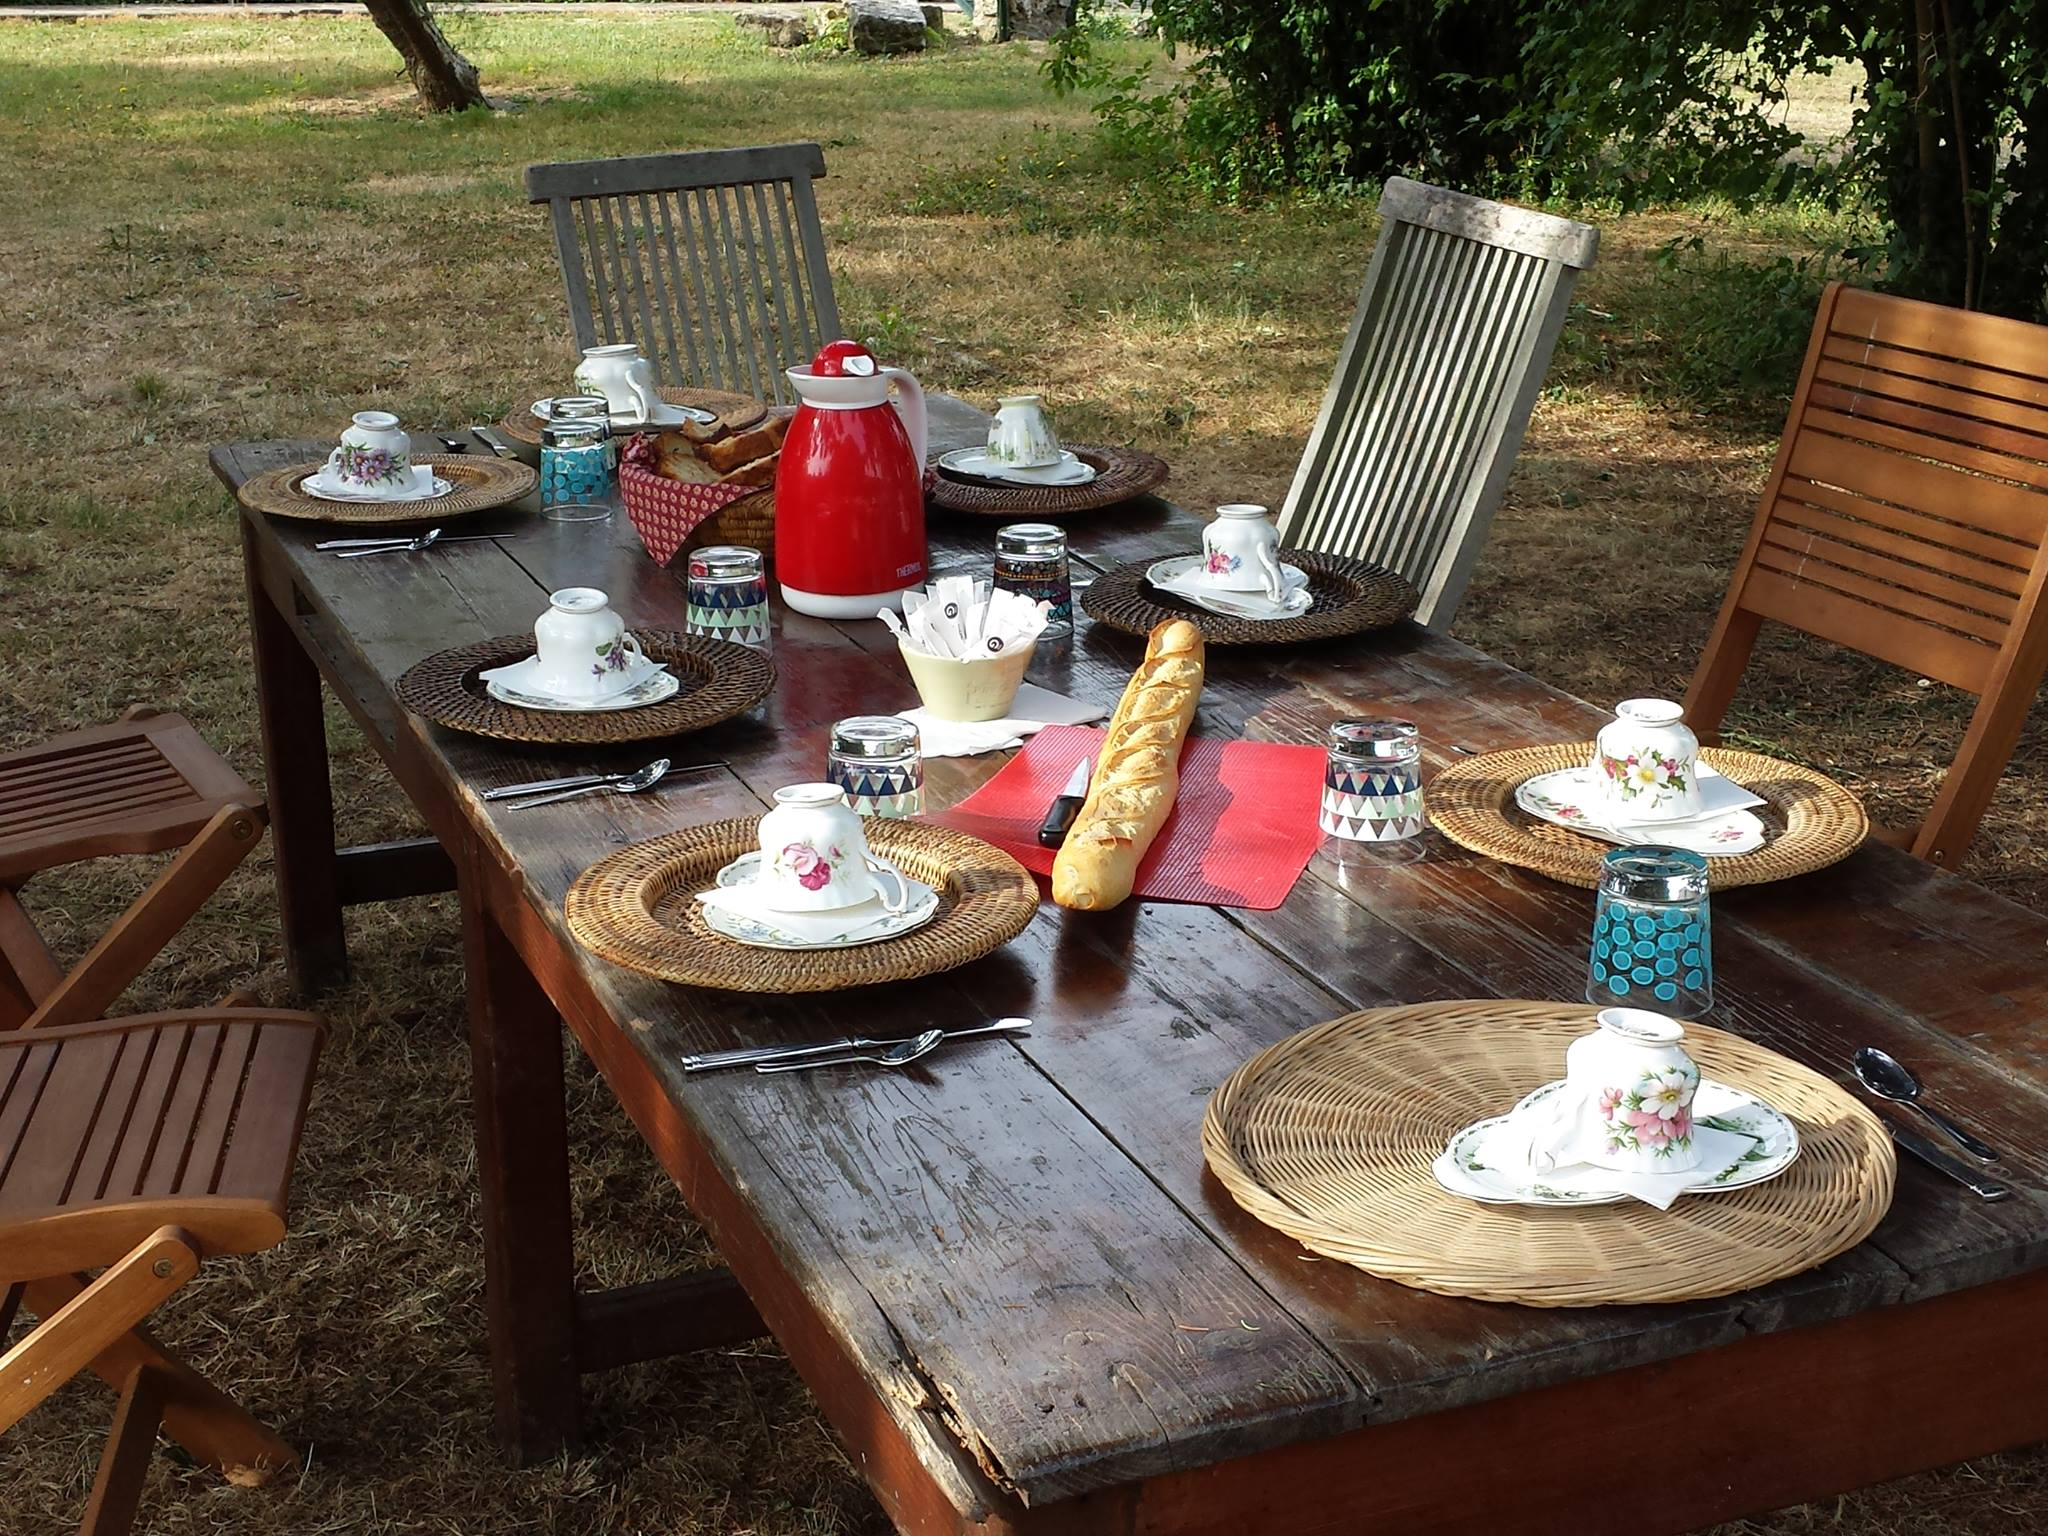 Petits dejeuners a la tuilerie les jardins de la tuilerie for Jardin de la tuilerie